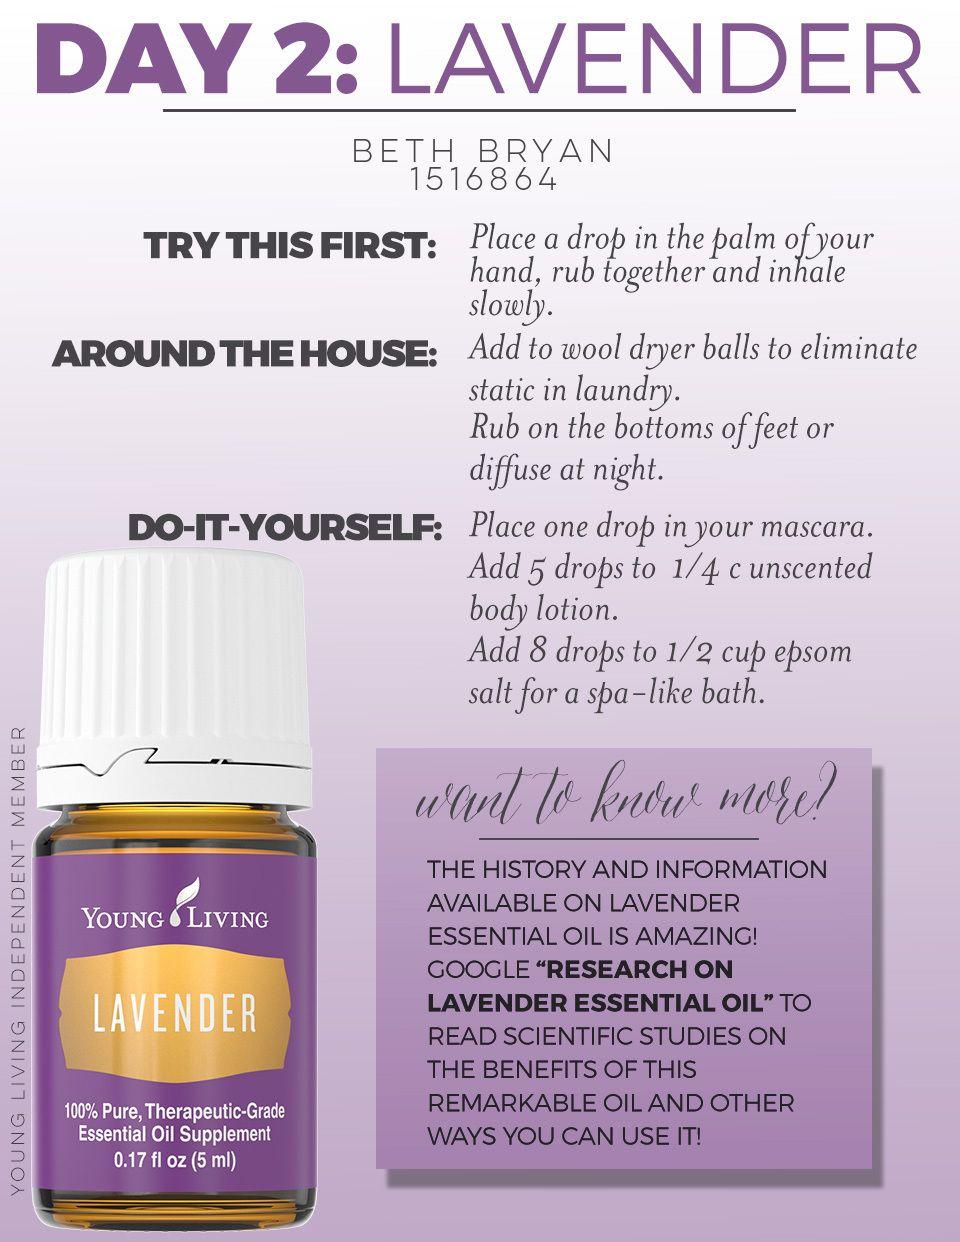 4 Ways to Use Lavender 4 Ways to Use Lavender new picture